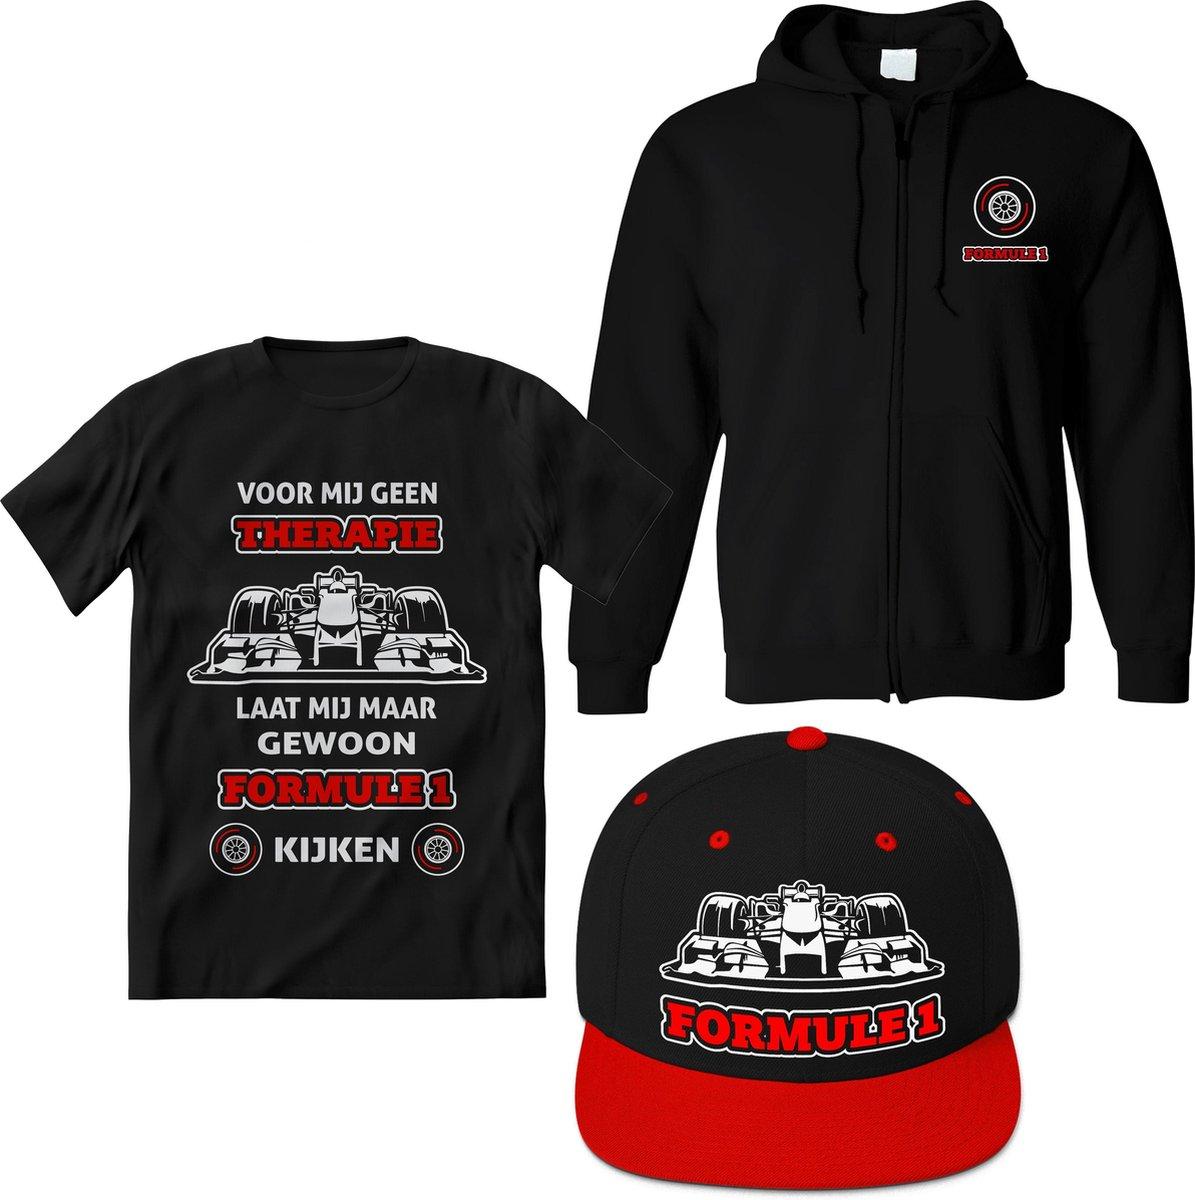 Formule 1 T-Shirt 3 in 1 set Heren / Dames – Design Race shirt Dames Rood – Perfect f1 raceauto Cadeau – Grappig Auto Racing tekst shirt - Maat M